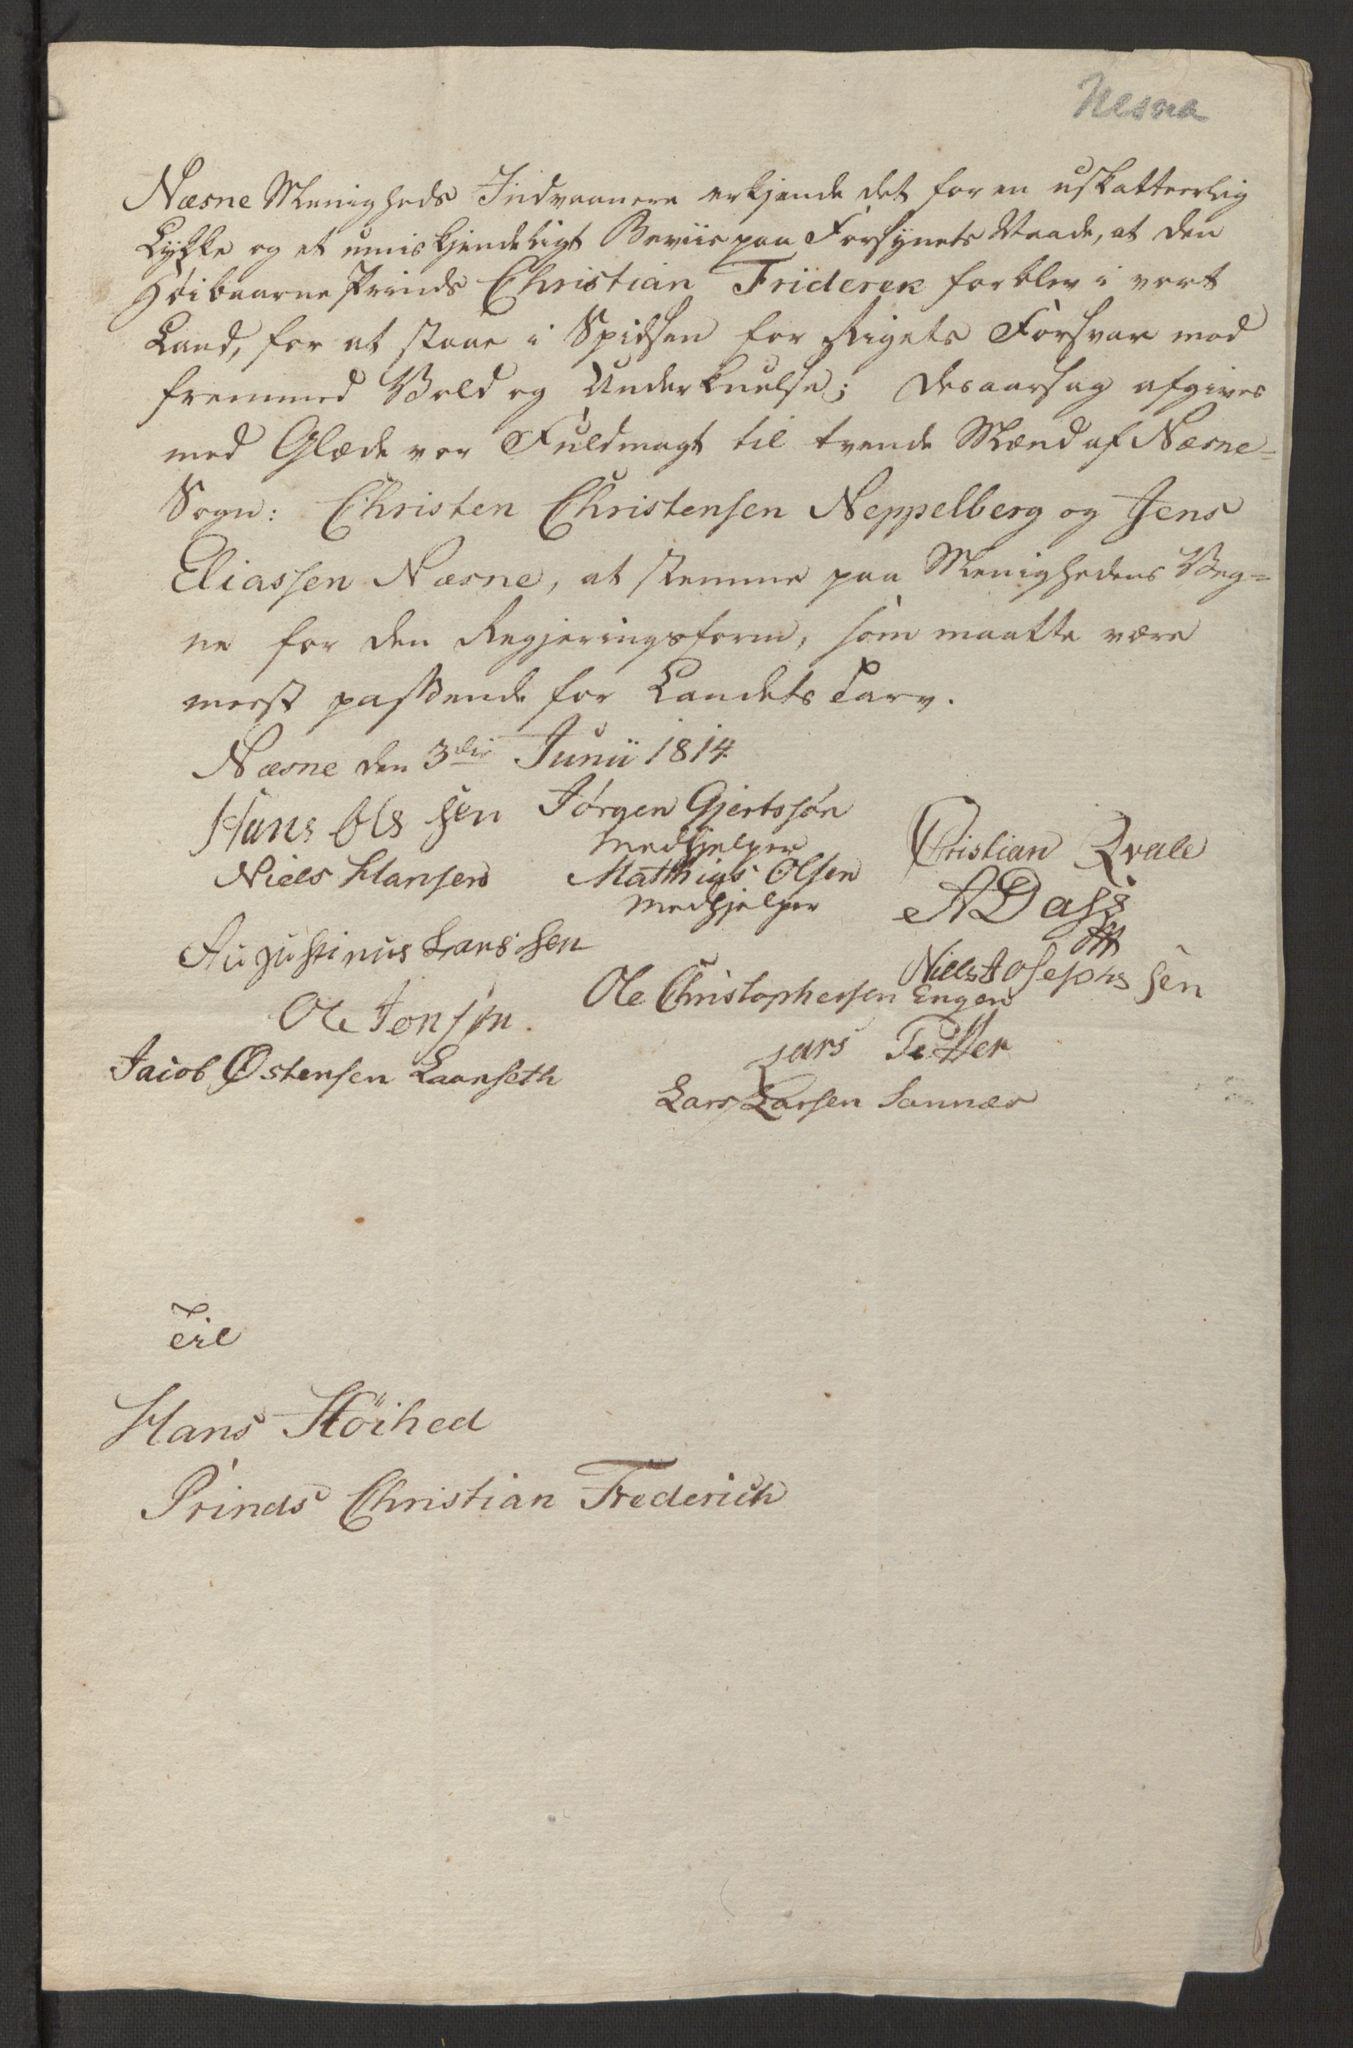 SAT, Nordland amt/fylke*, 1814, s. 34